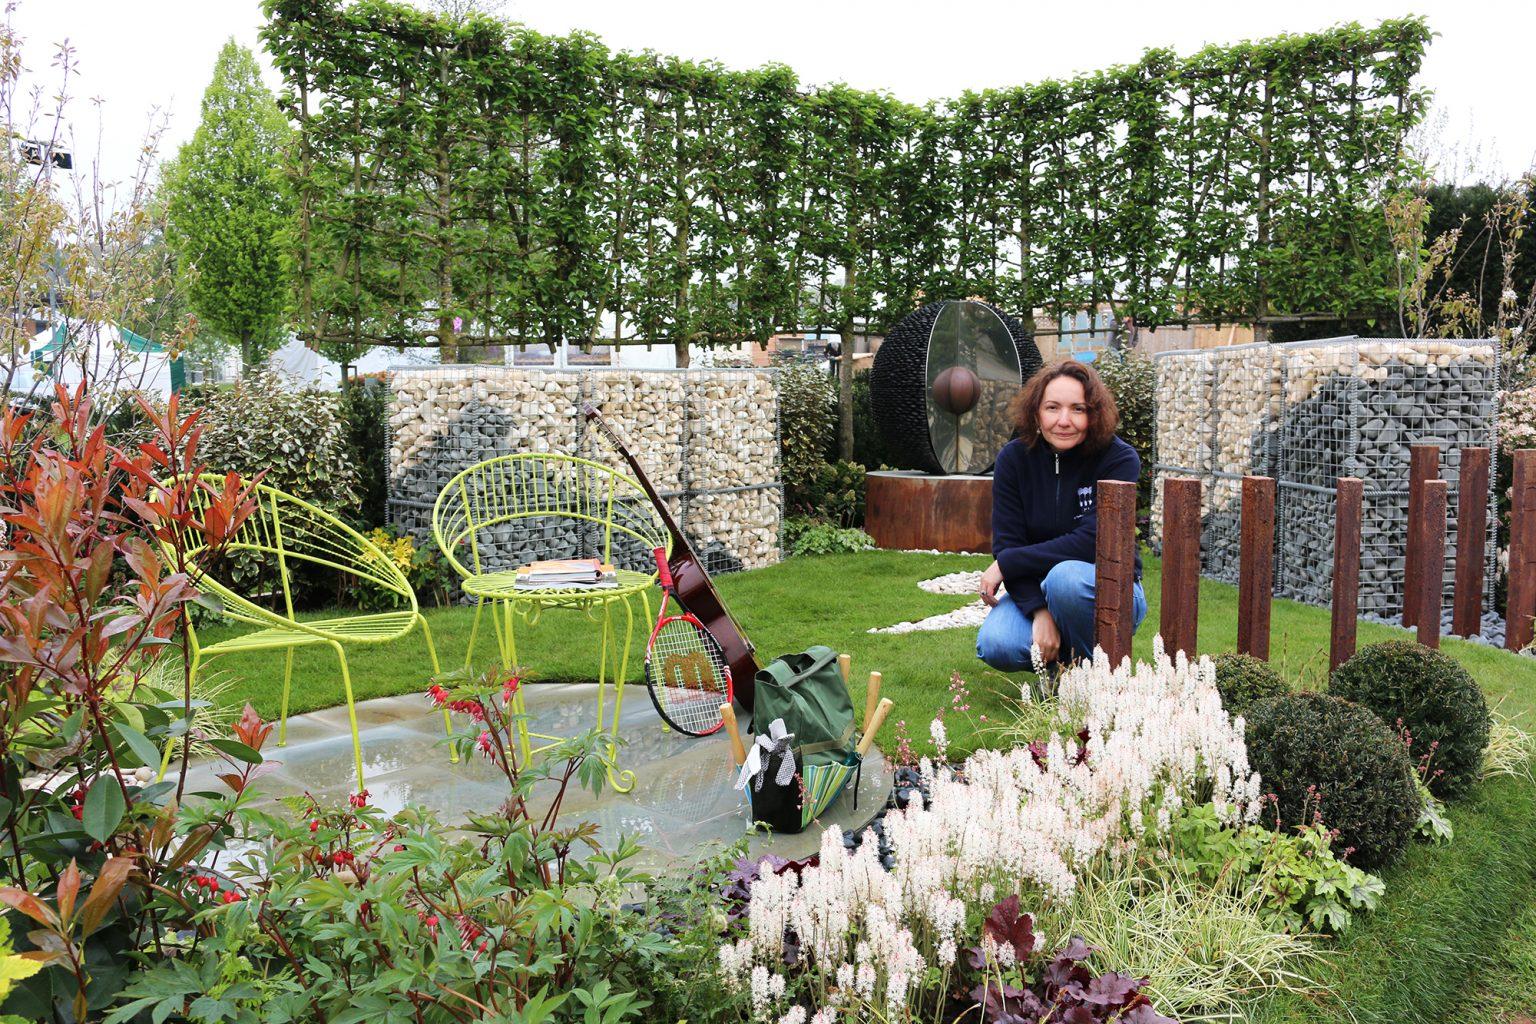 Mental health garden takes gold at Harrogate Flower Show